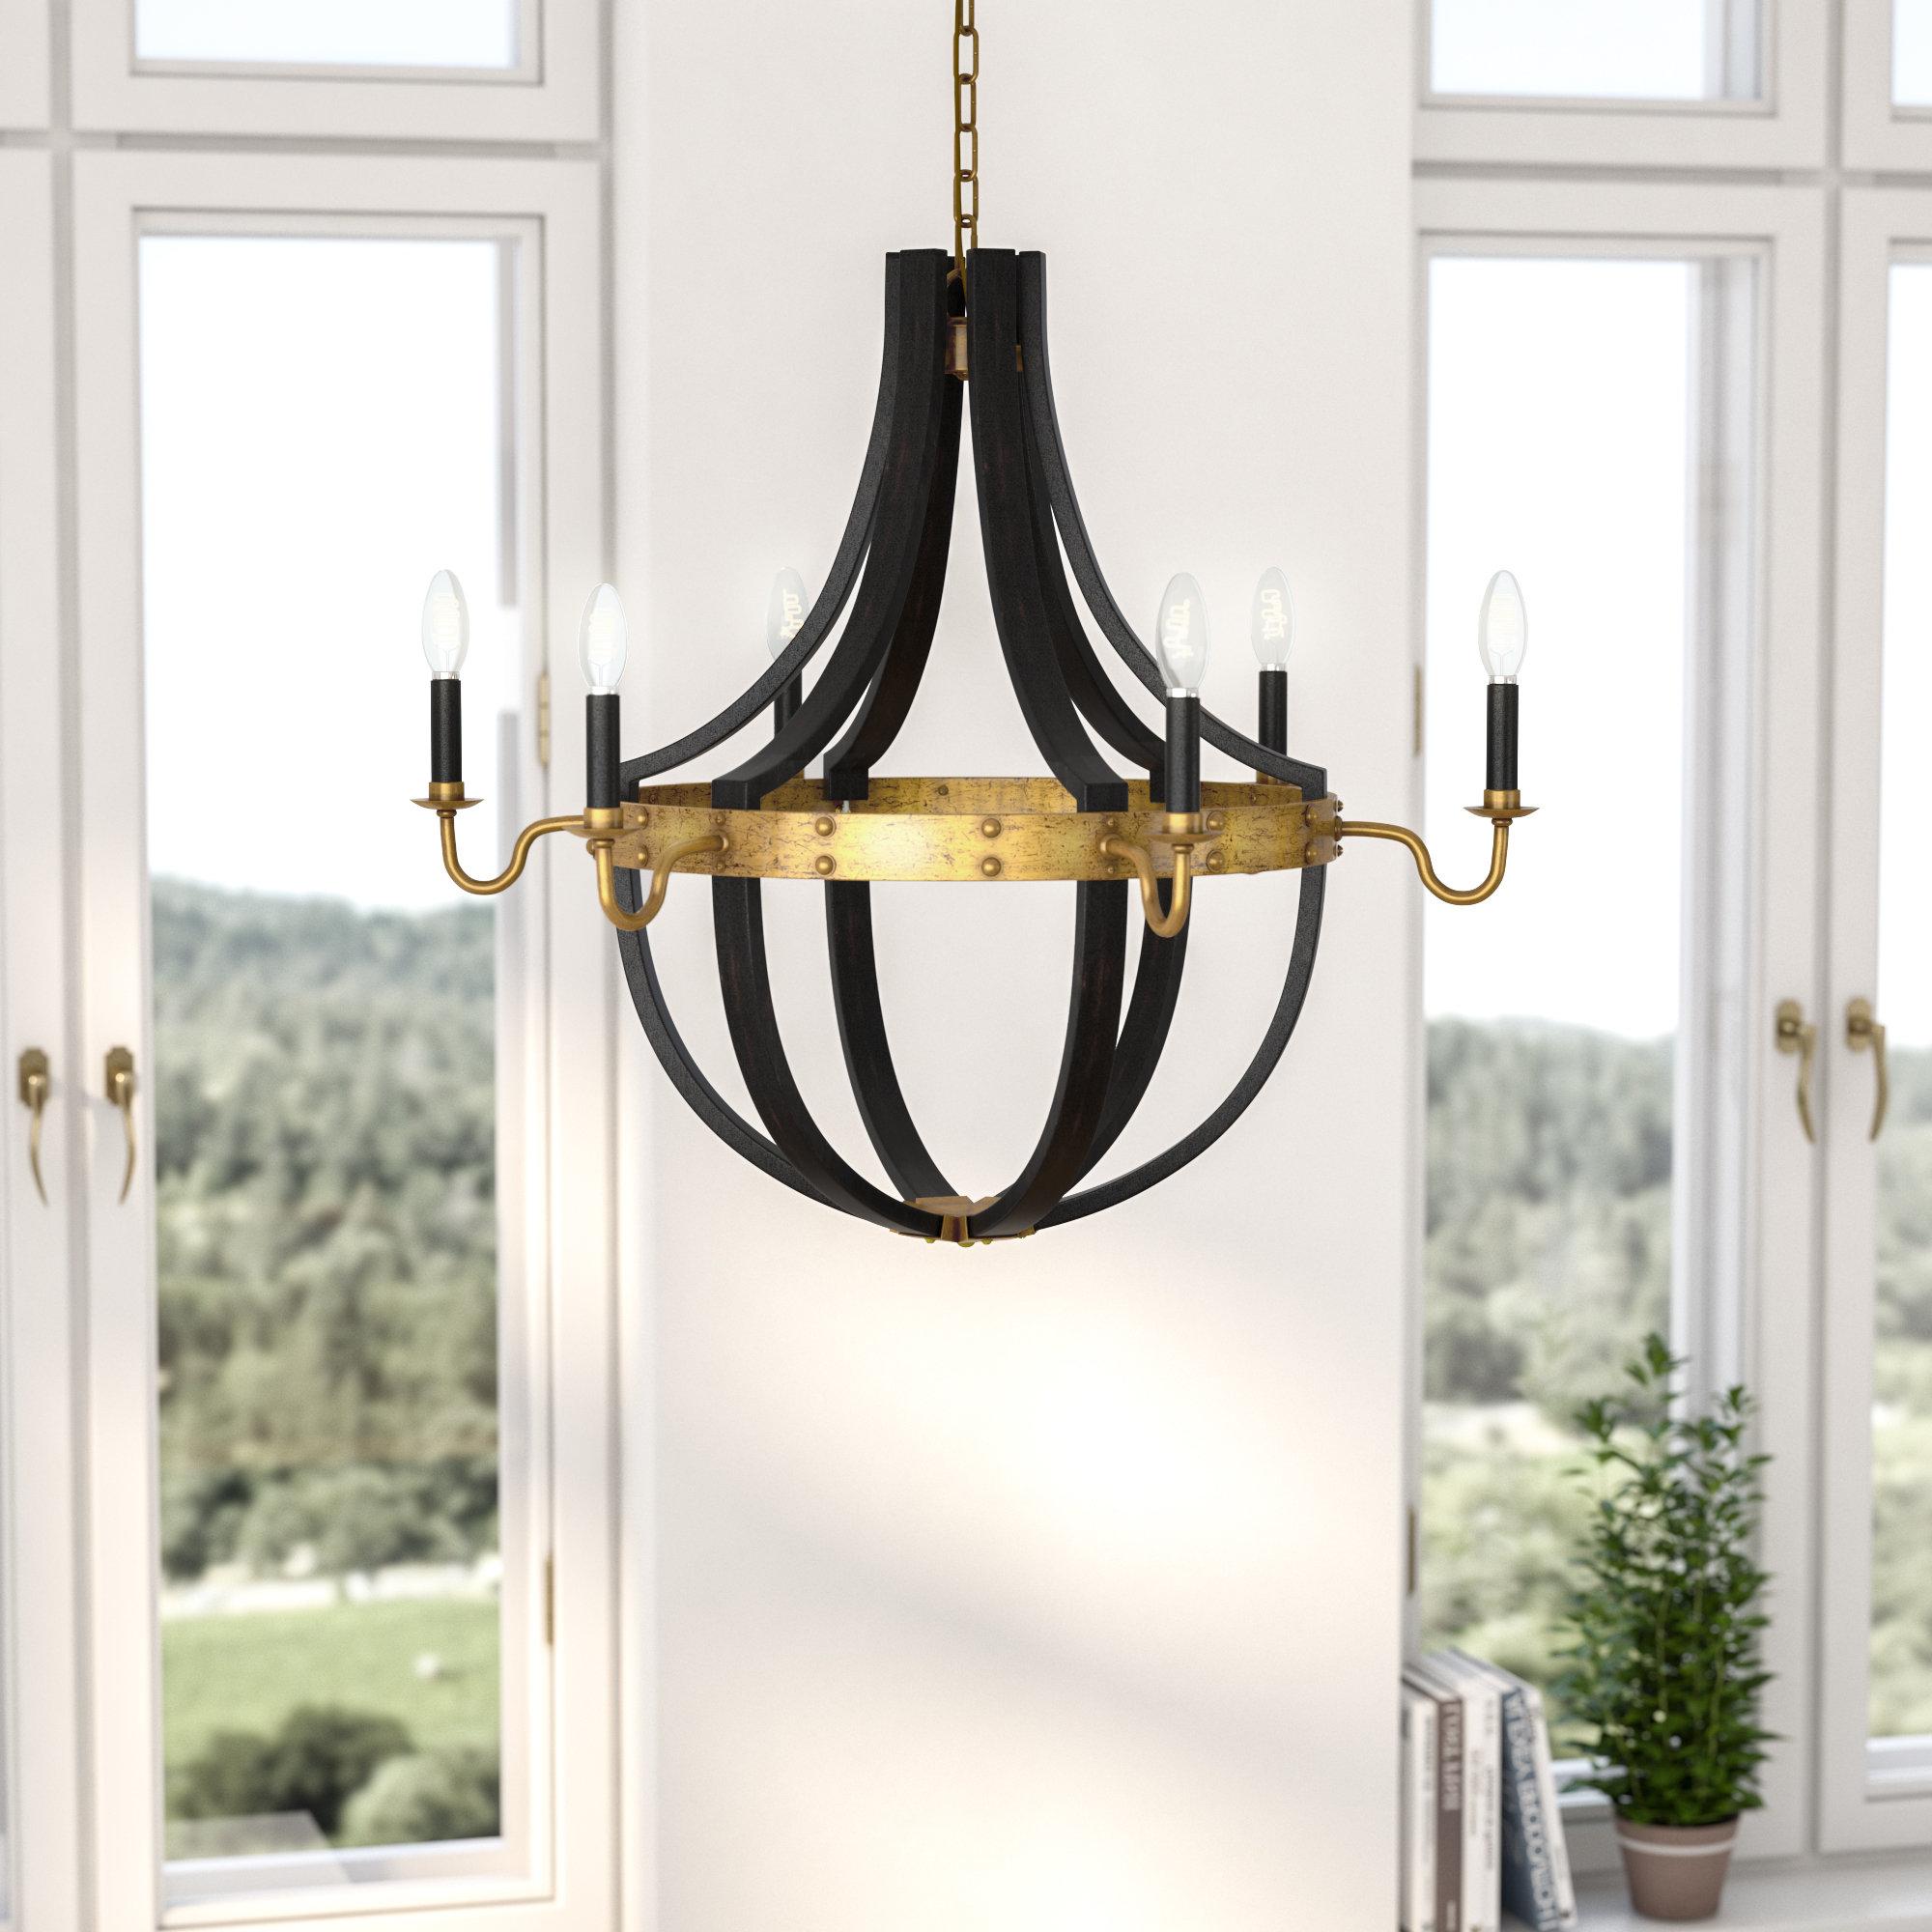 Favorite La Sarre 3 Light Globe Chandeliers Within Karteek 6 Light Led Empire Chandelier (View 13 of 25)